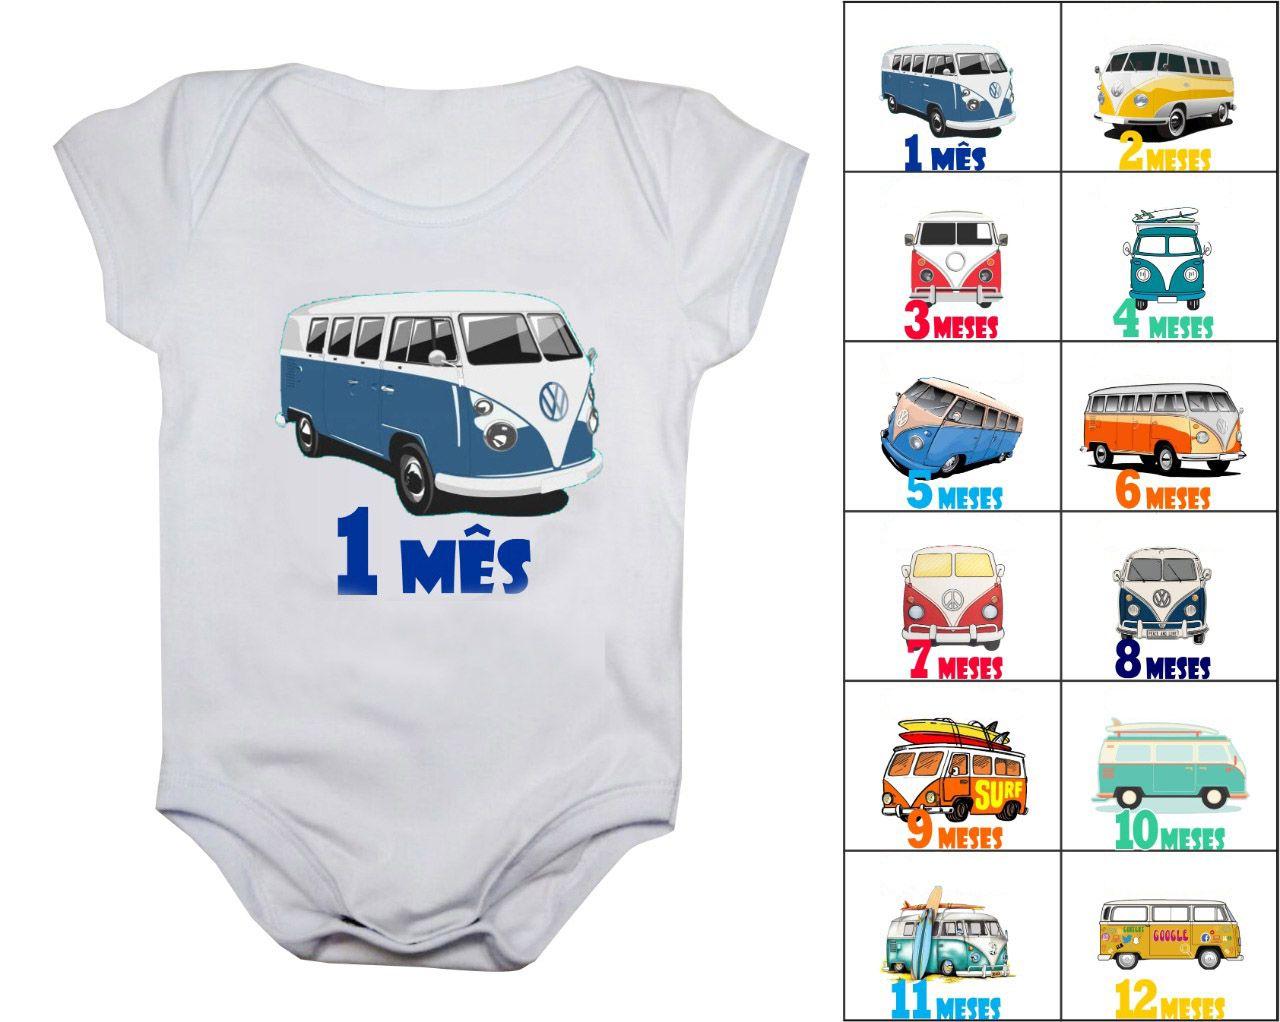 Kit body mesversario kombi 12 bodies de bebê de 1 ao 12 meses